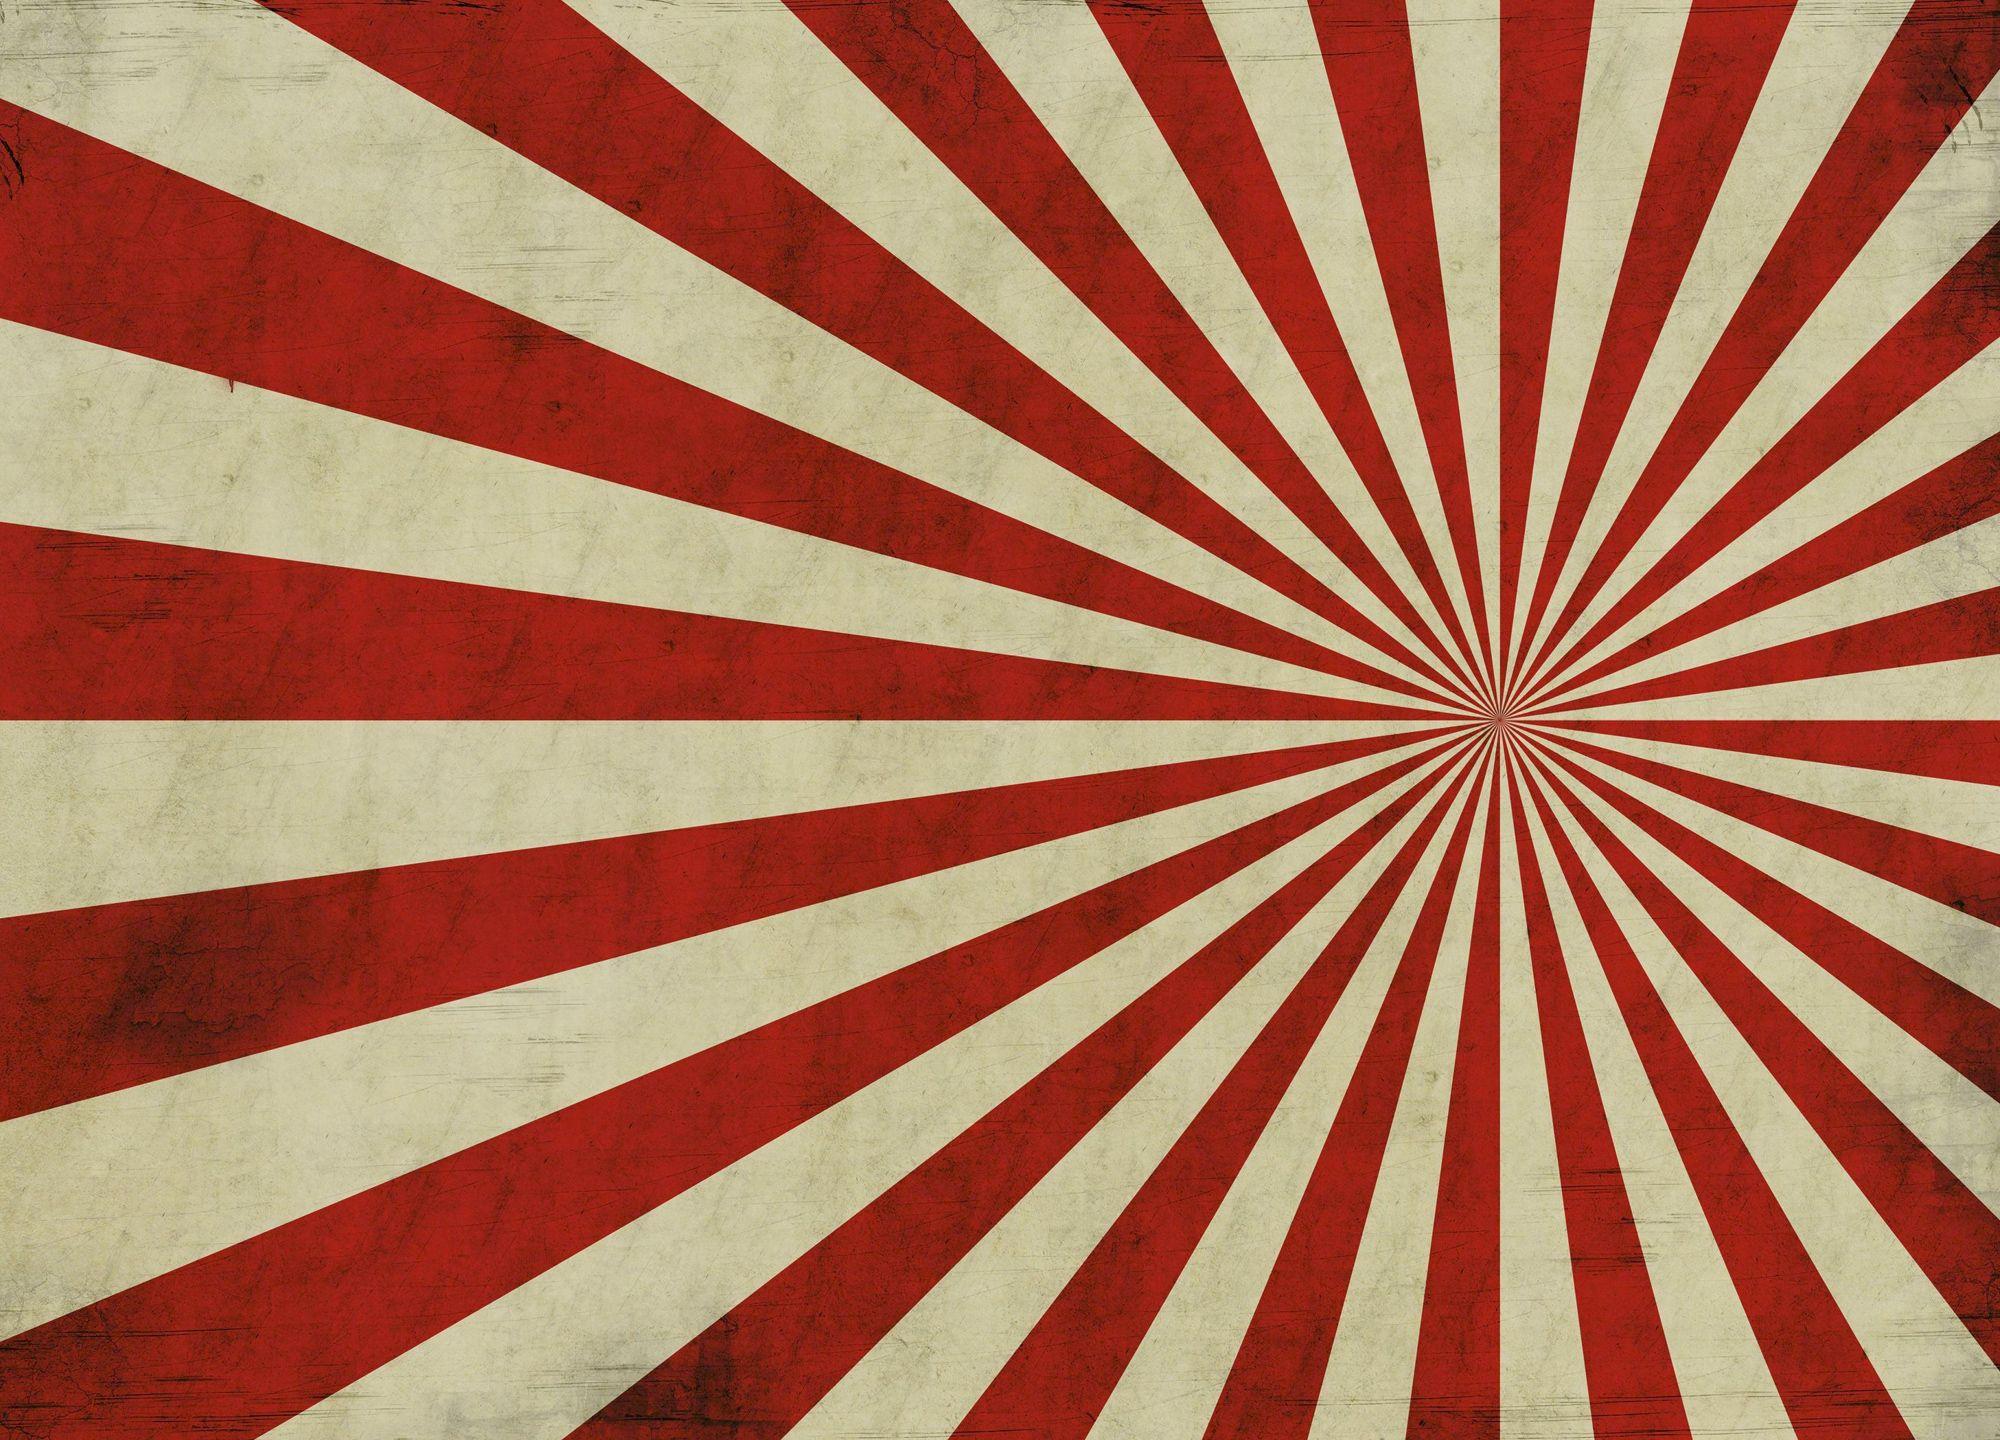 Sunburst Wallpaper Hd Wallpapers Backgrounds Of Your Choice Retro Background Album Art Design Circus Wallpaper